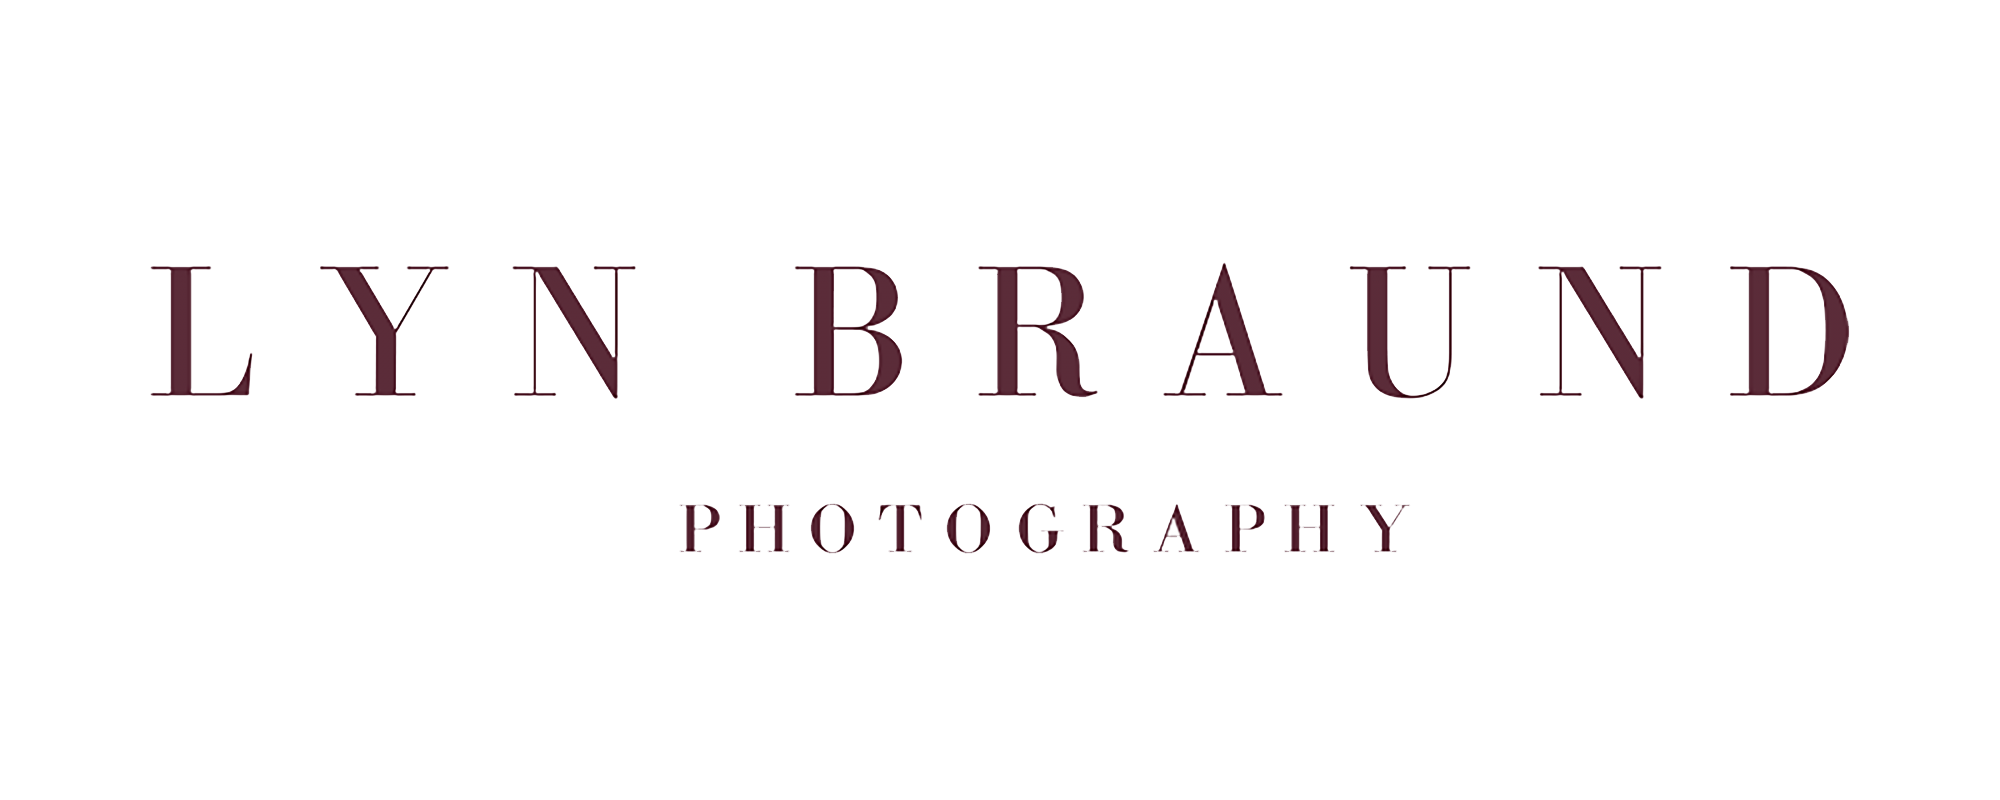 lyn Braund Photography